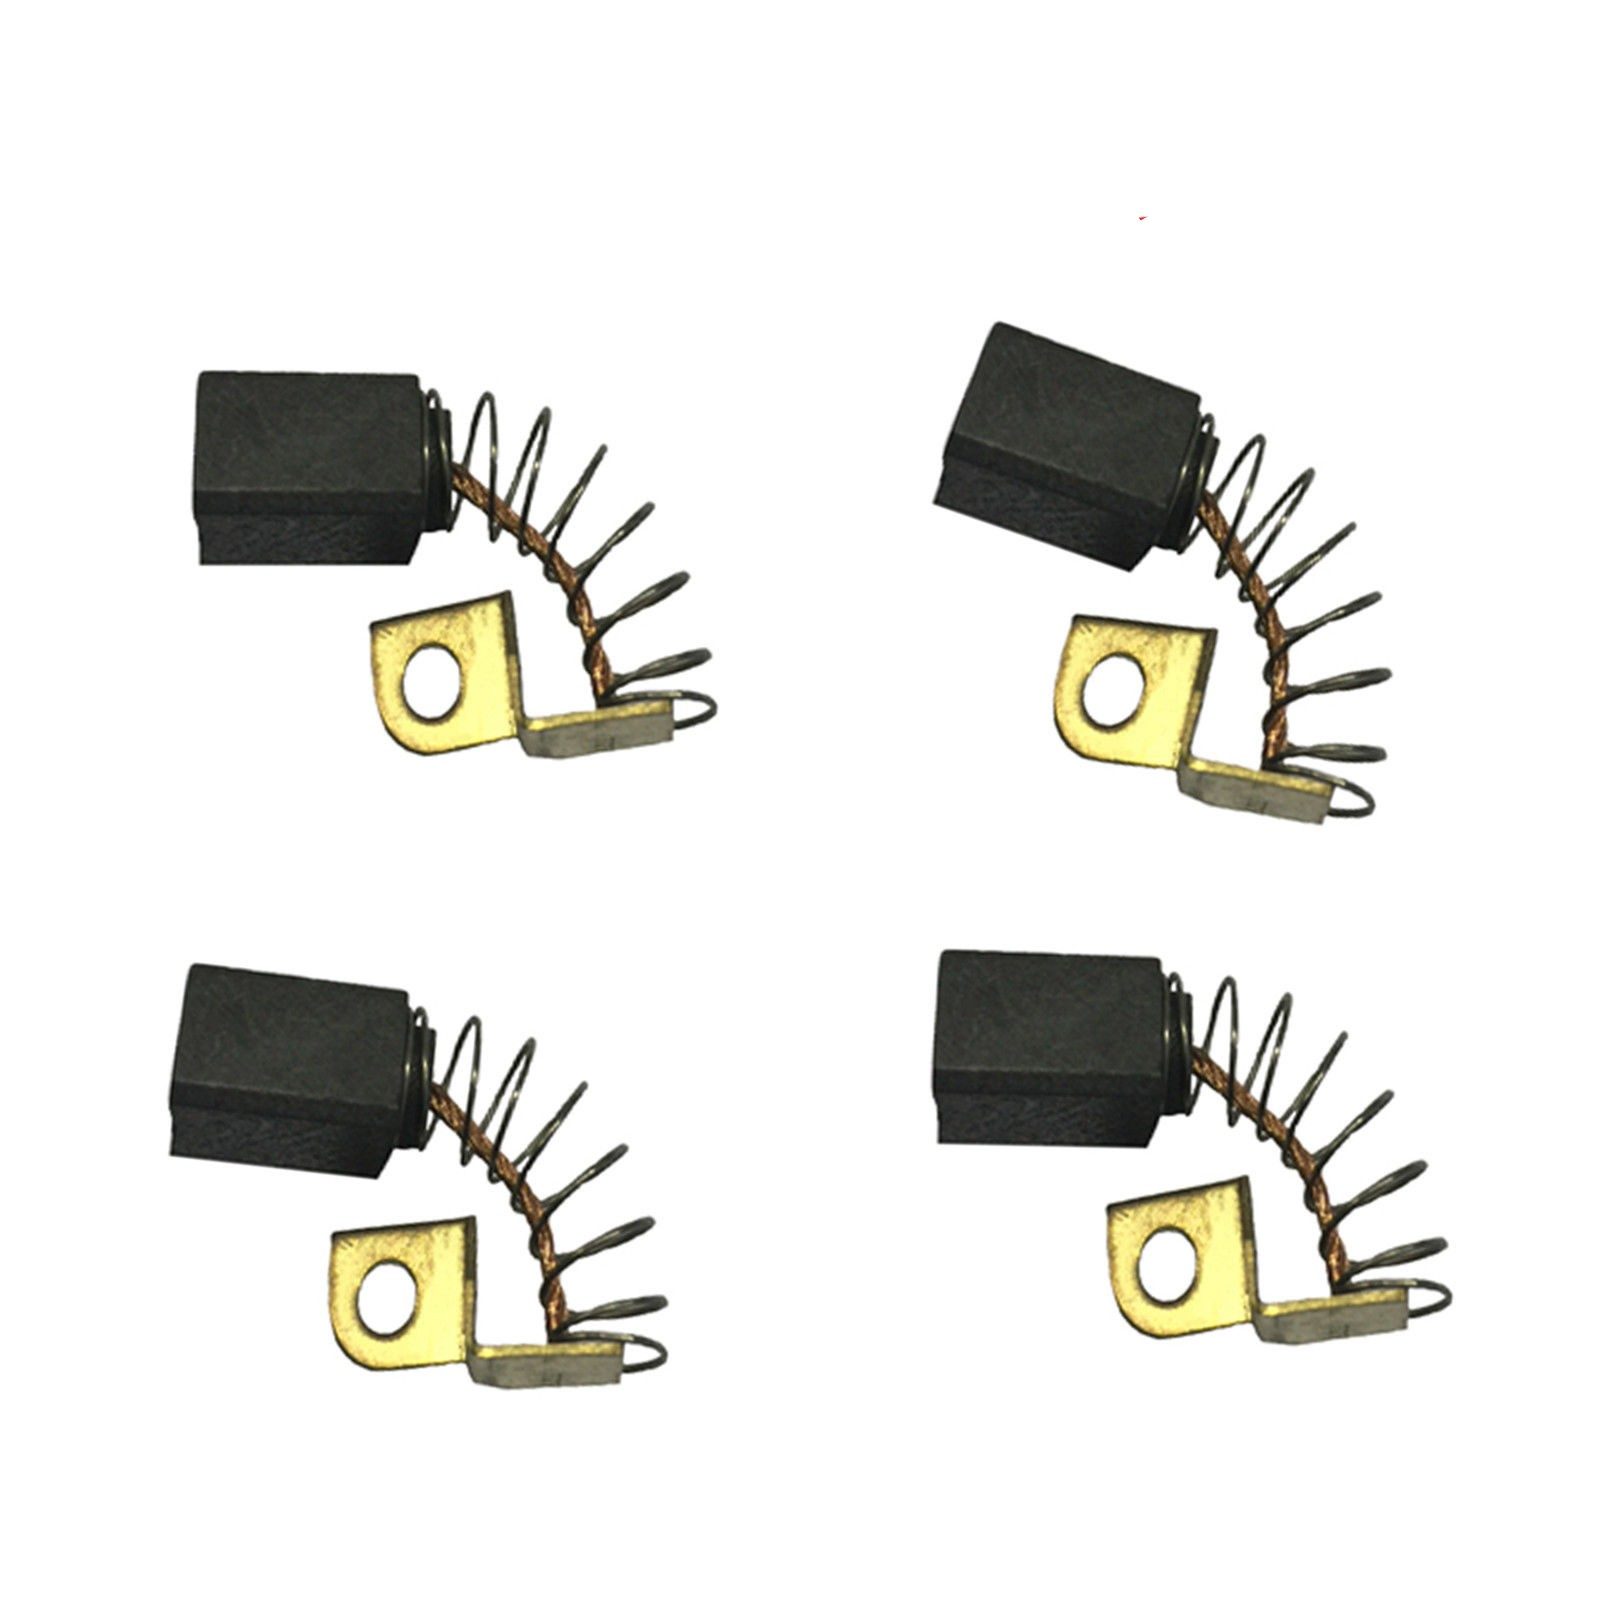 Porter-Cable Parts Kits